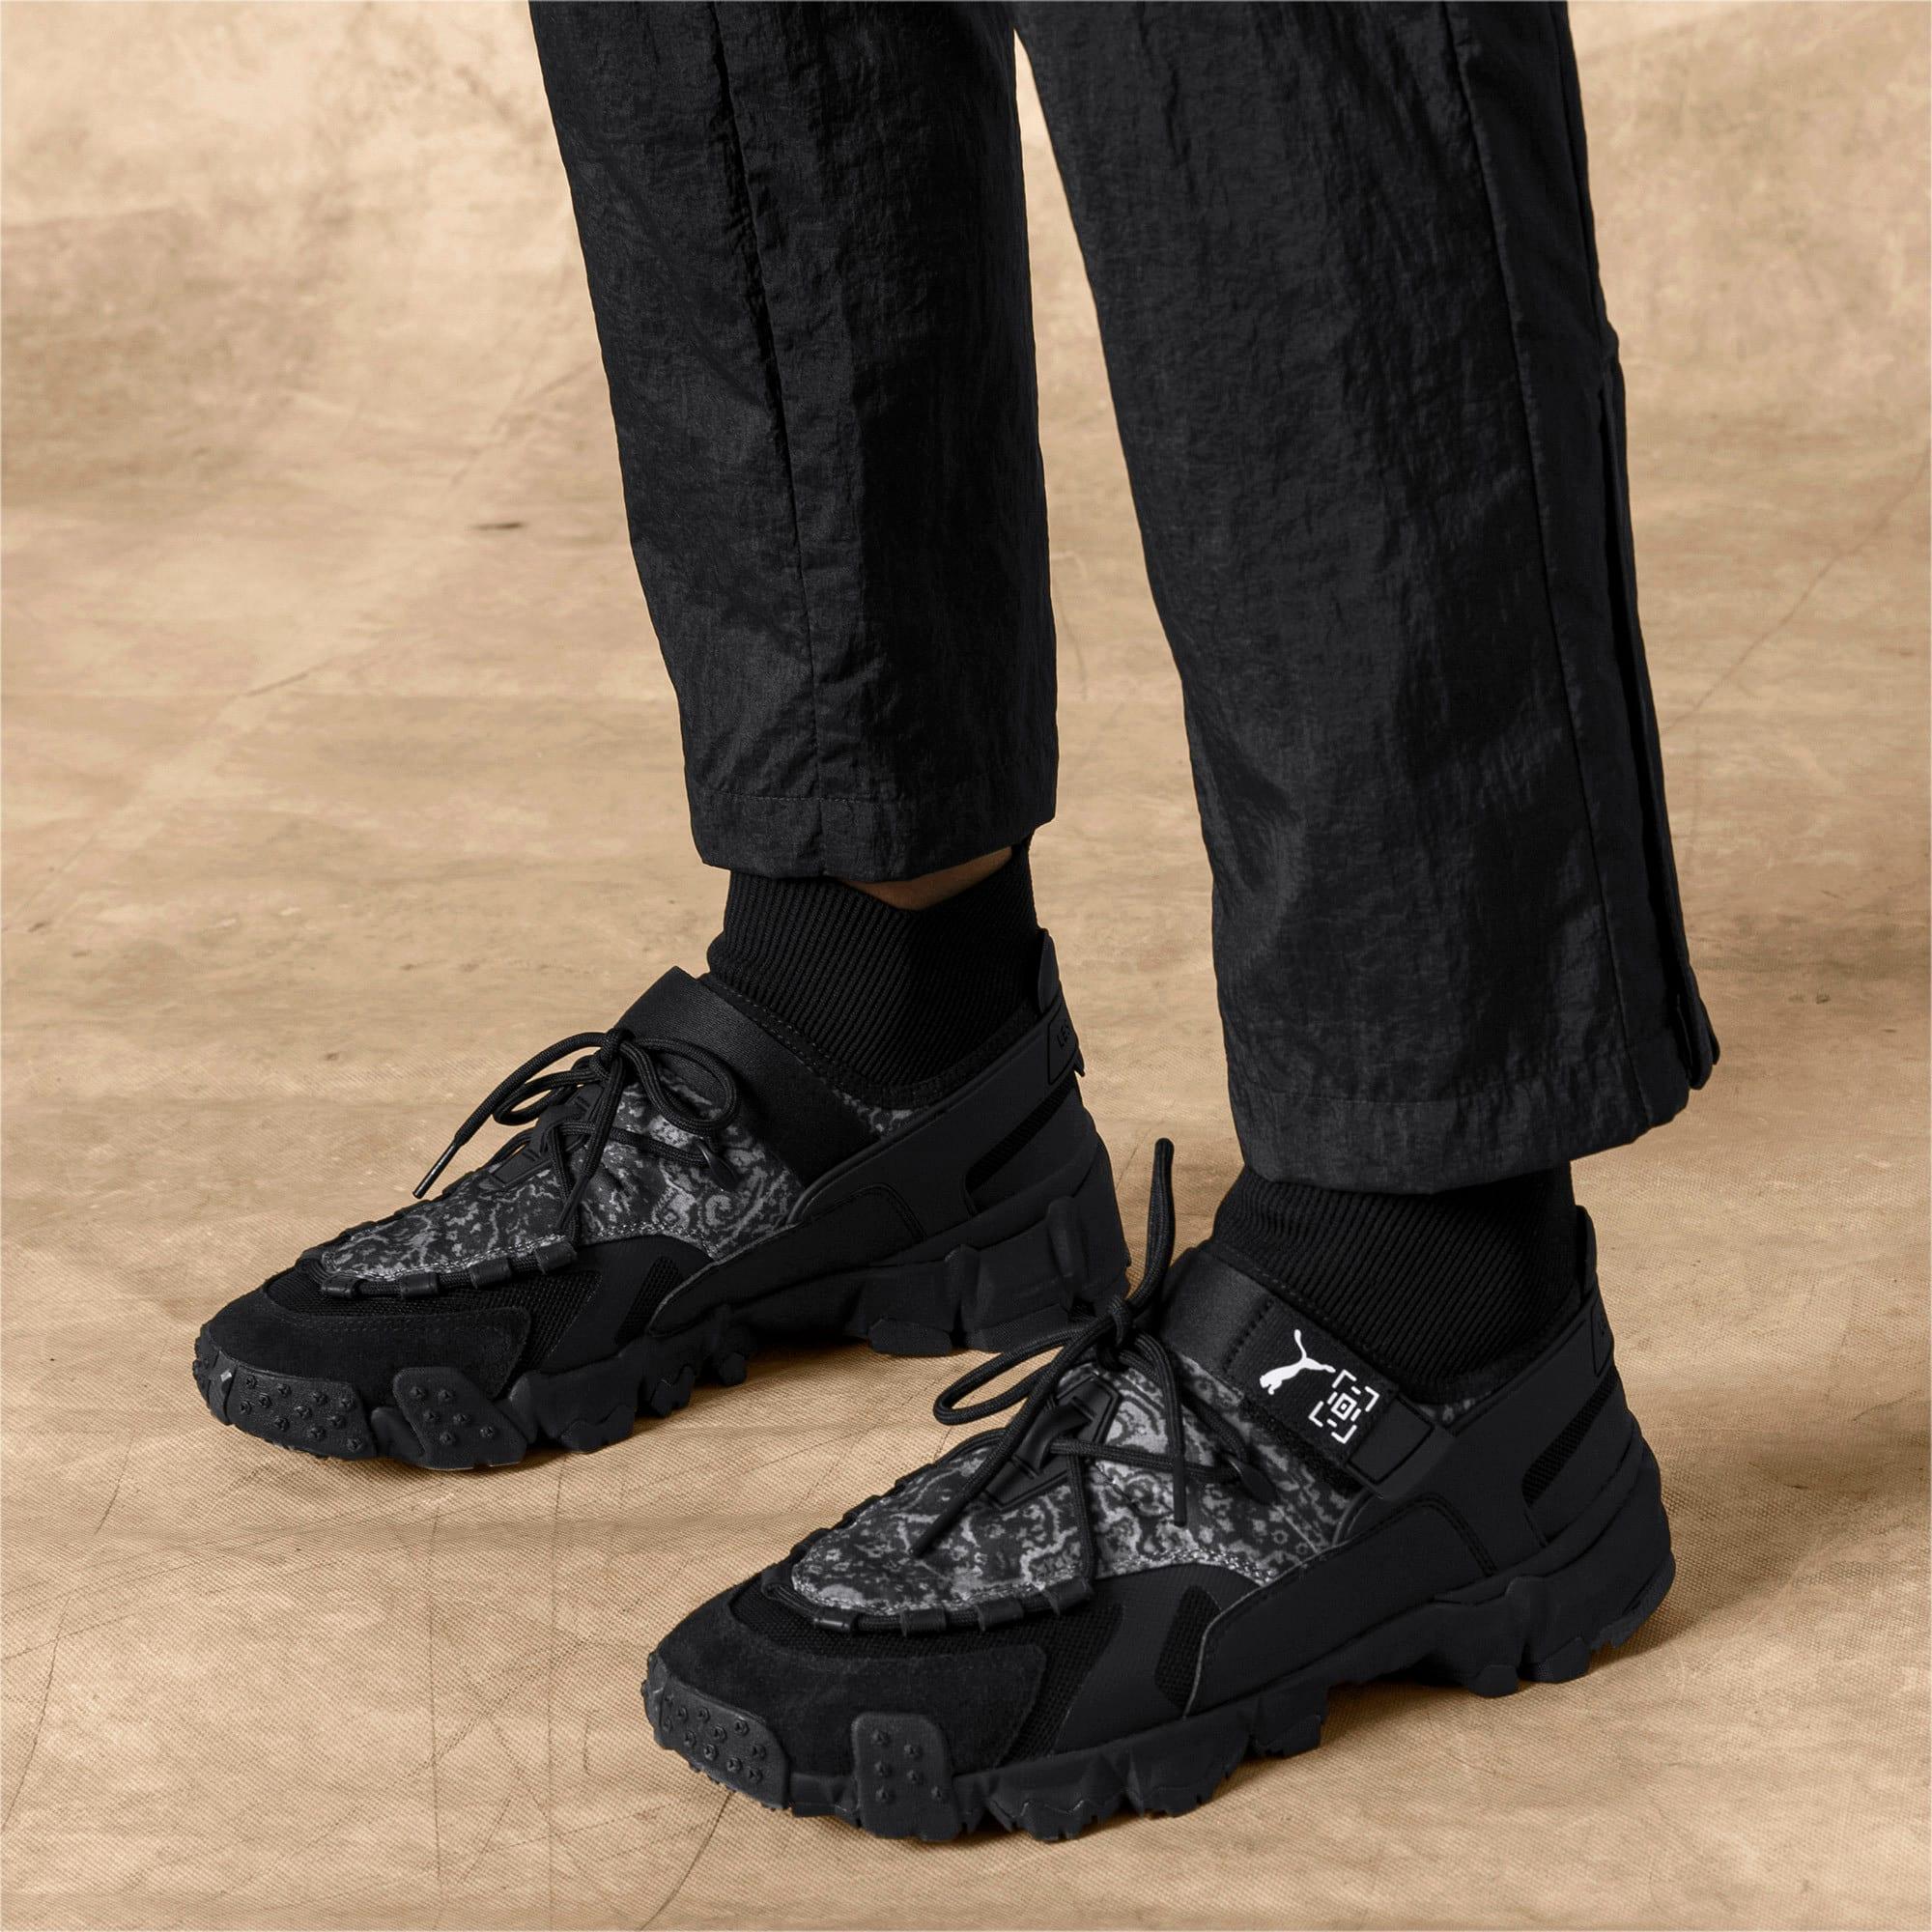 Thumbnail 2 van PUMA x LES BENJAMINS Trailfox schoenen, Puma Black, medium